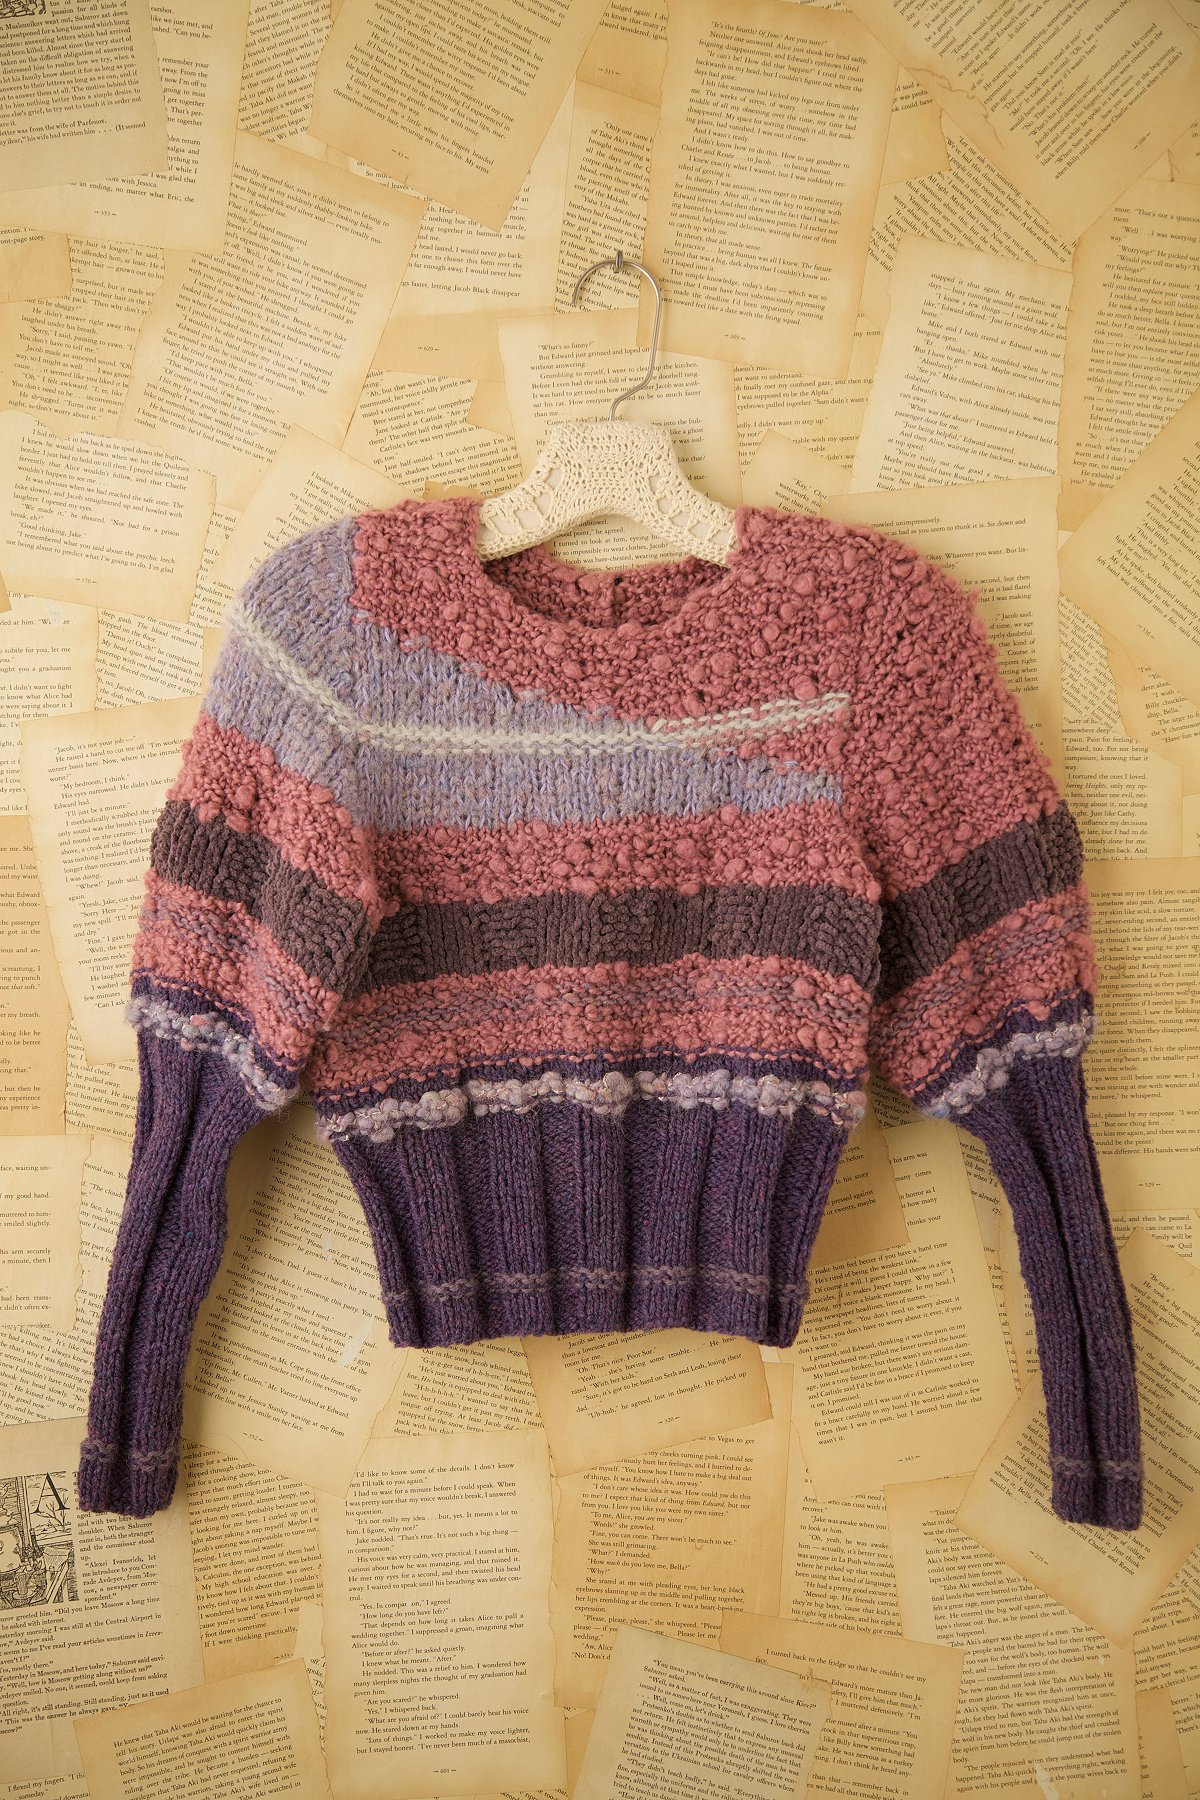 Vintage 1980s High Collar Sweater